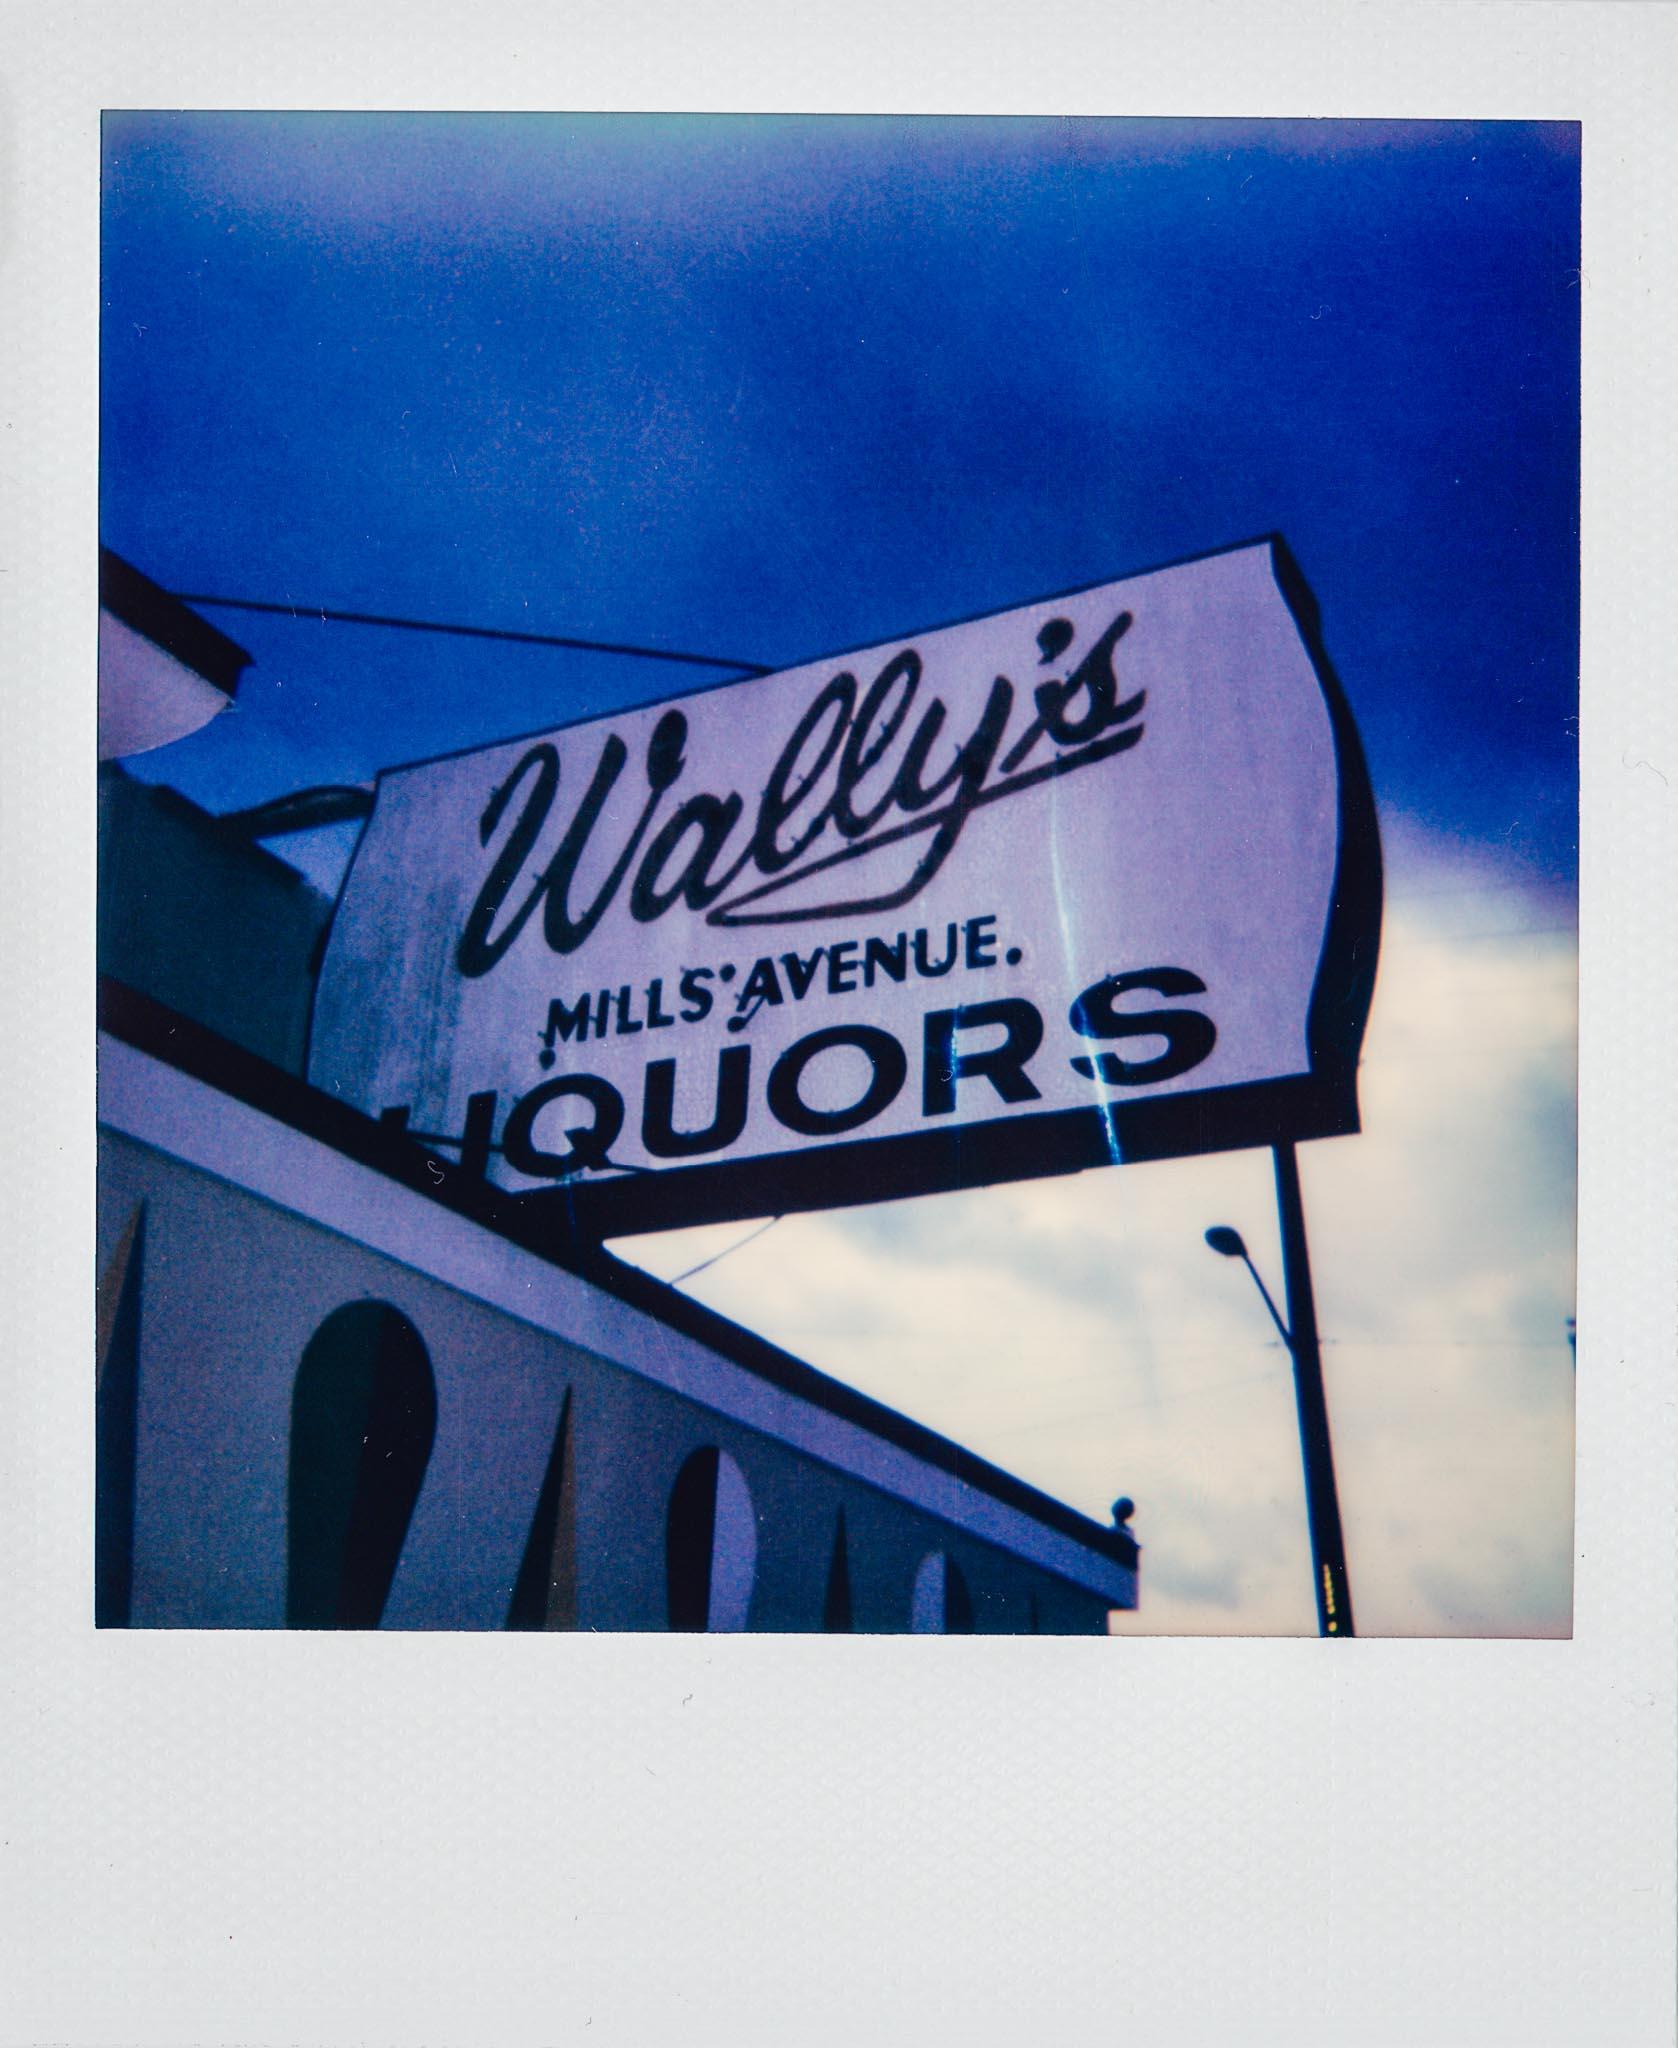 Polaroid of Wally's Mills Avenue Liquors Outdoor Sign